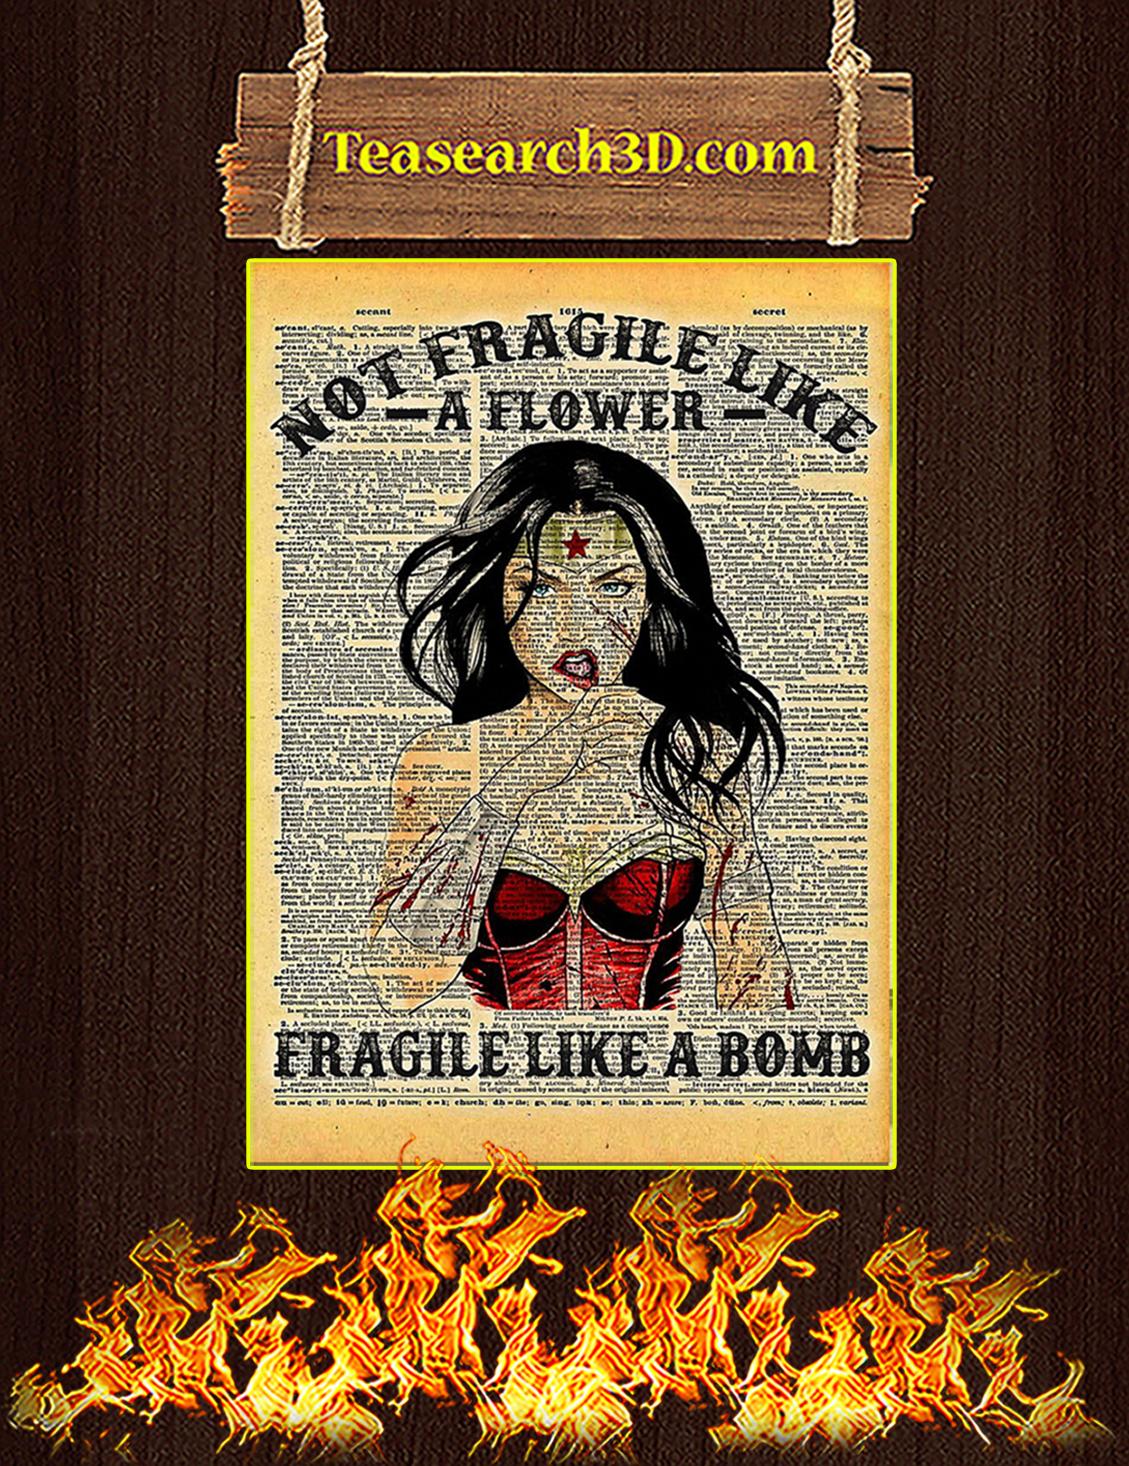 Wonder woman not fragile like a flower fragile like a bomb poster A3